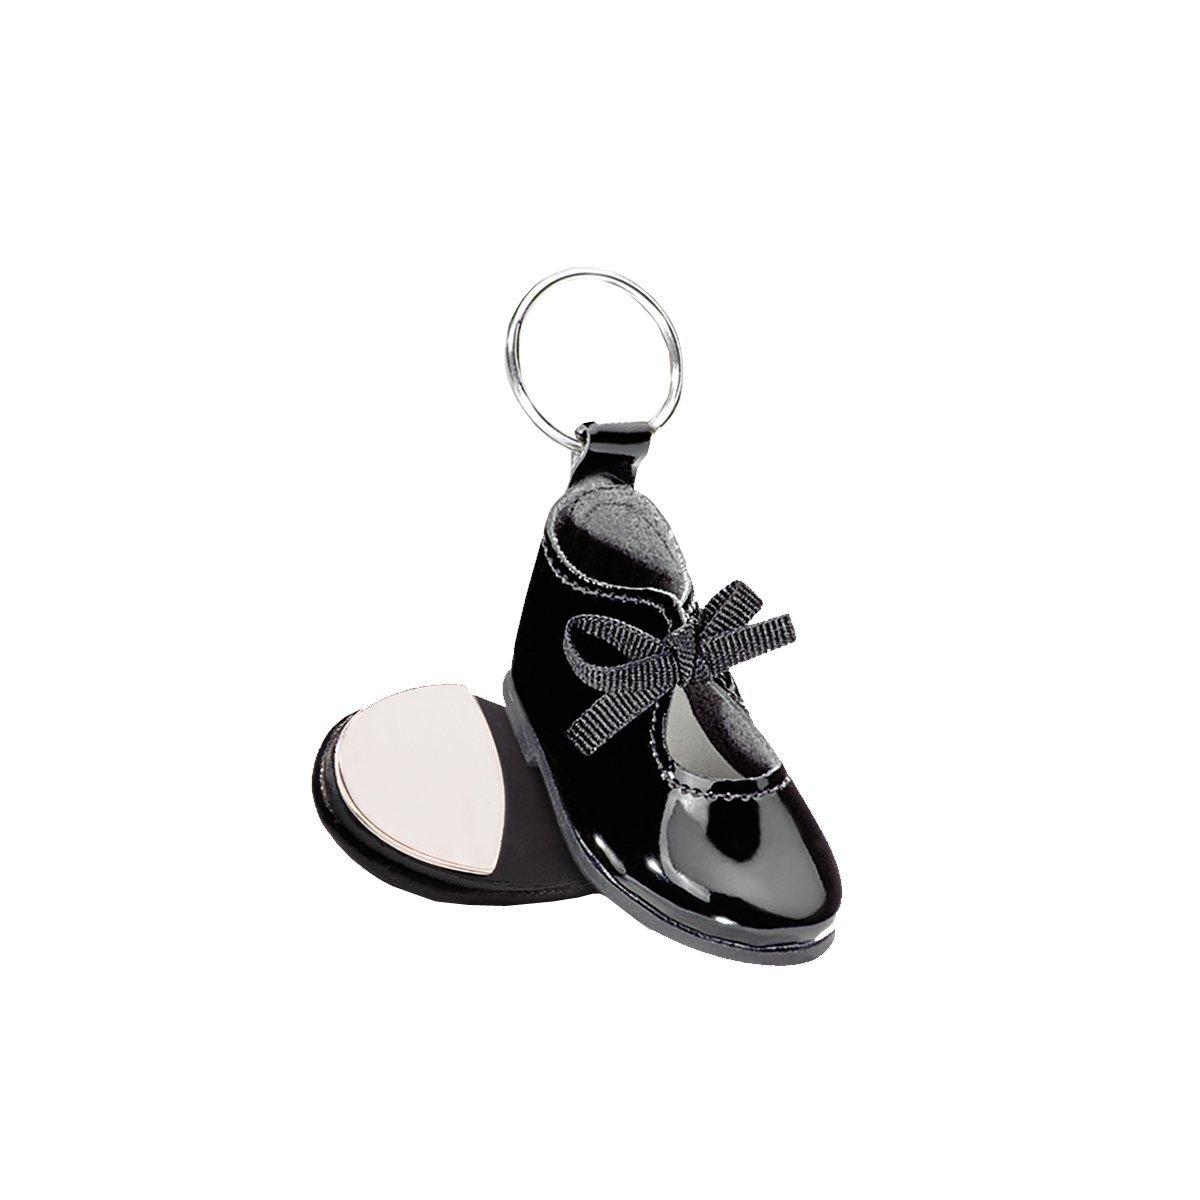 Sodanca Tap Key Chain